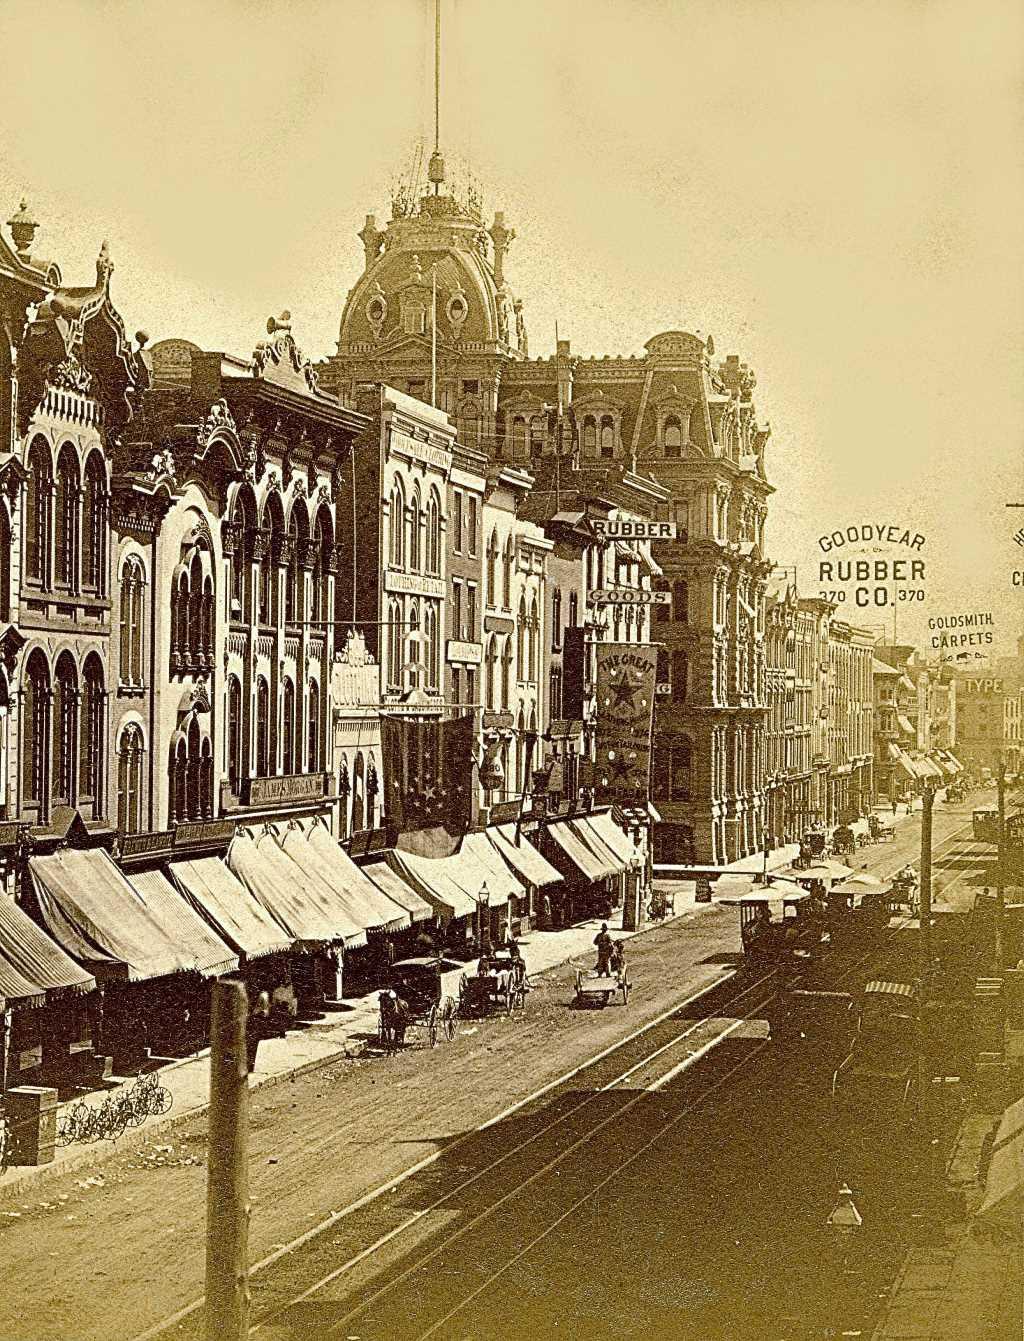 Water Street in 1880. Image courtesy of Jeff Beutner.